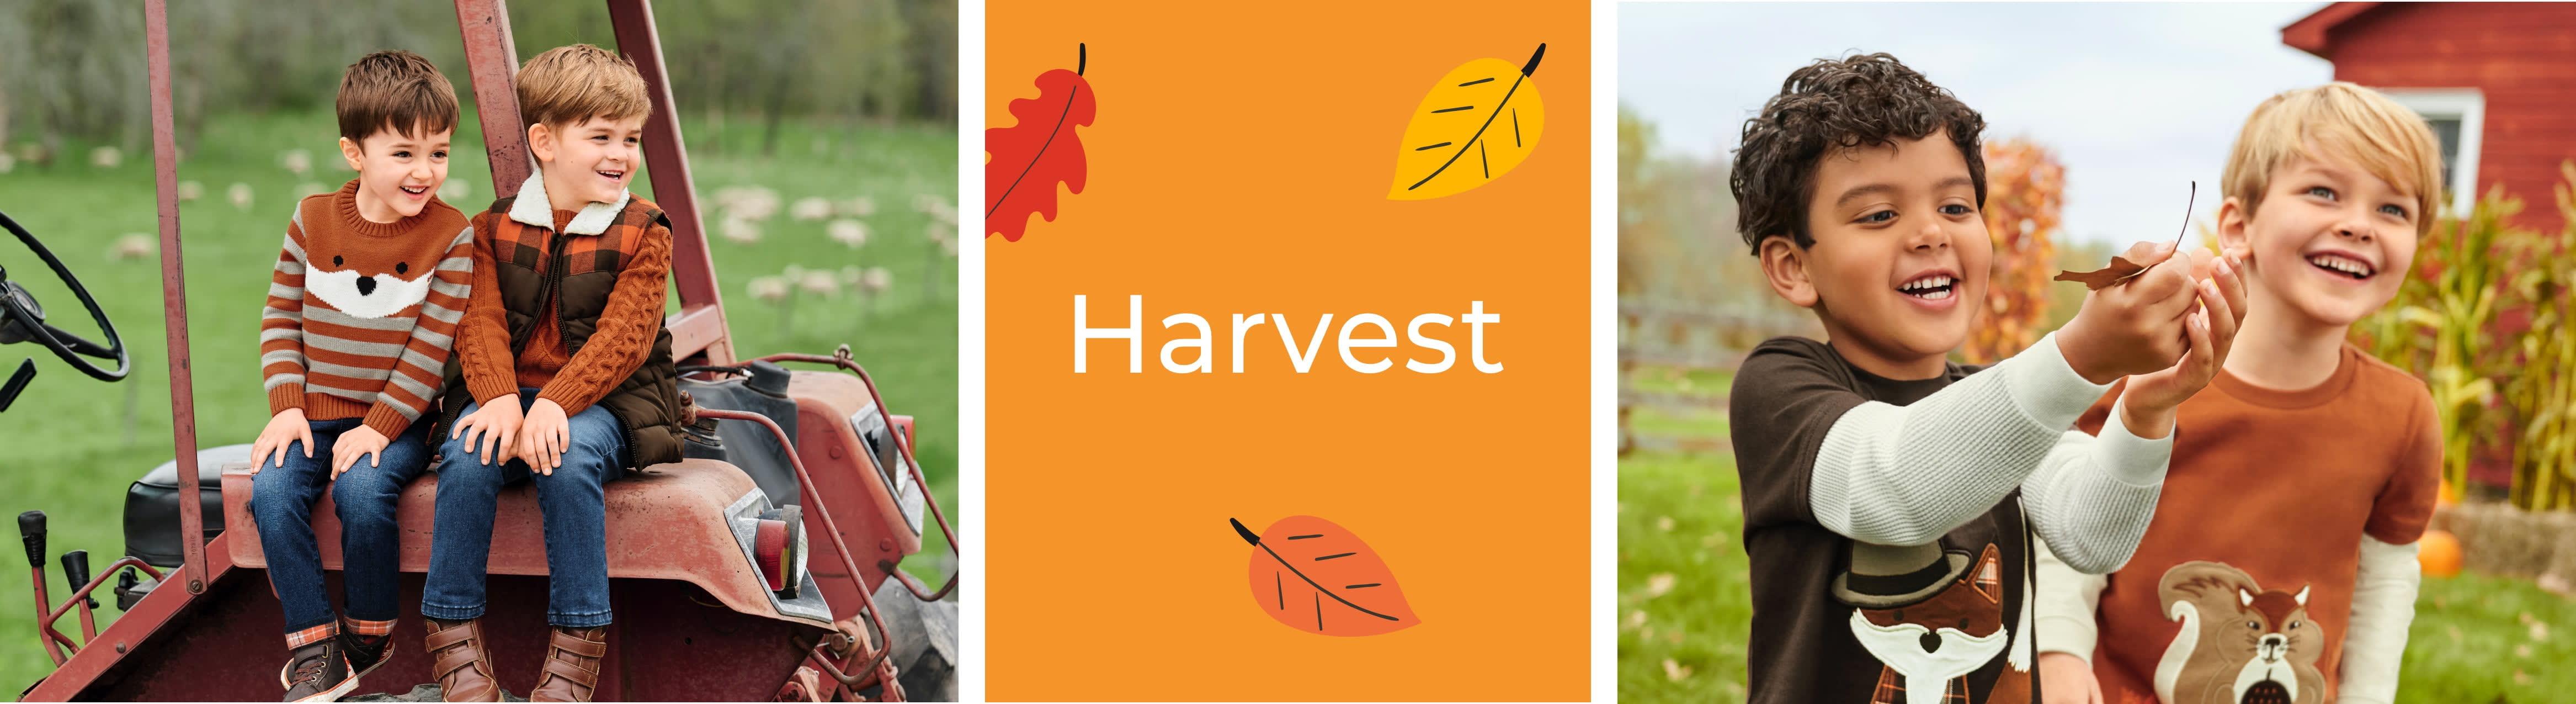 Boy Harvest